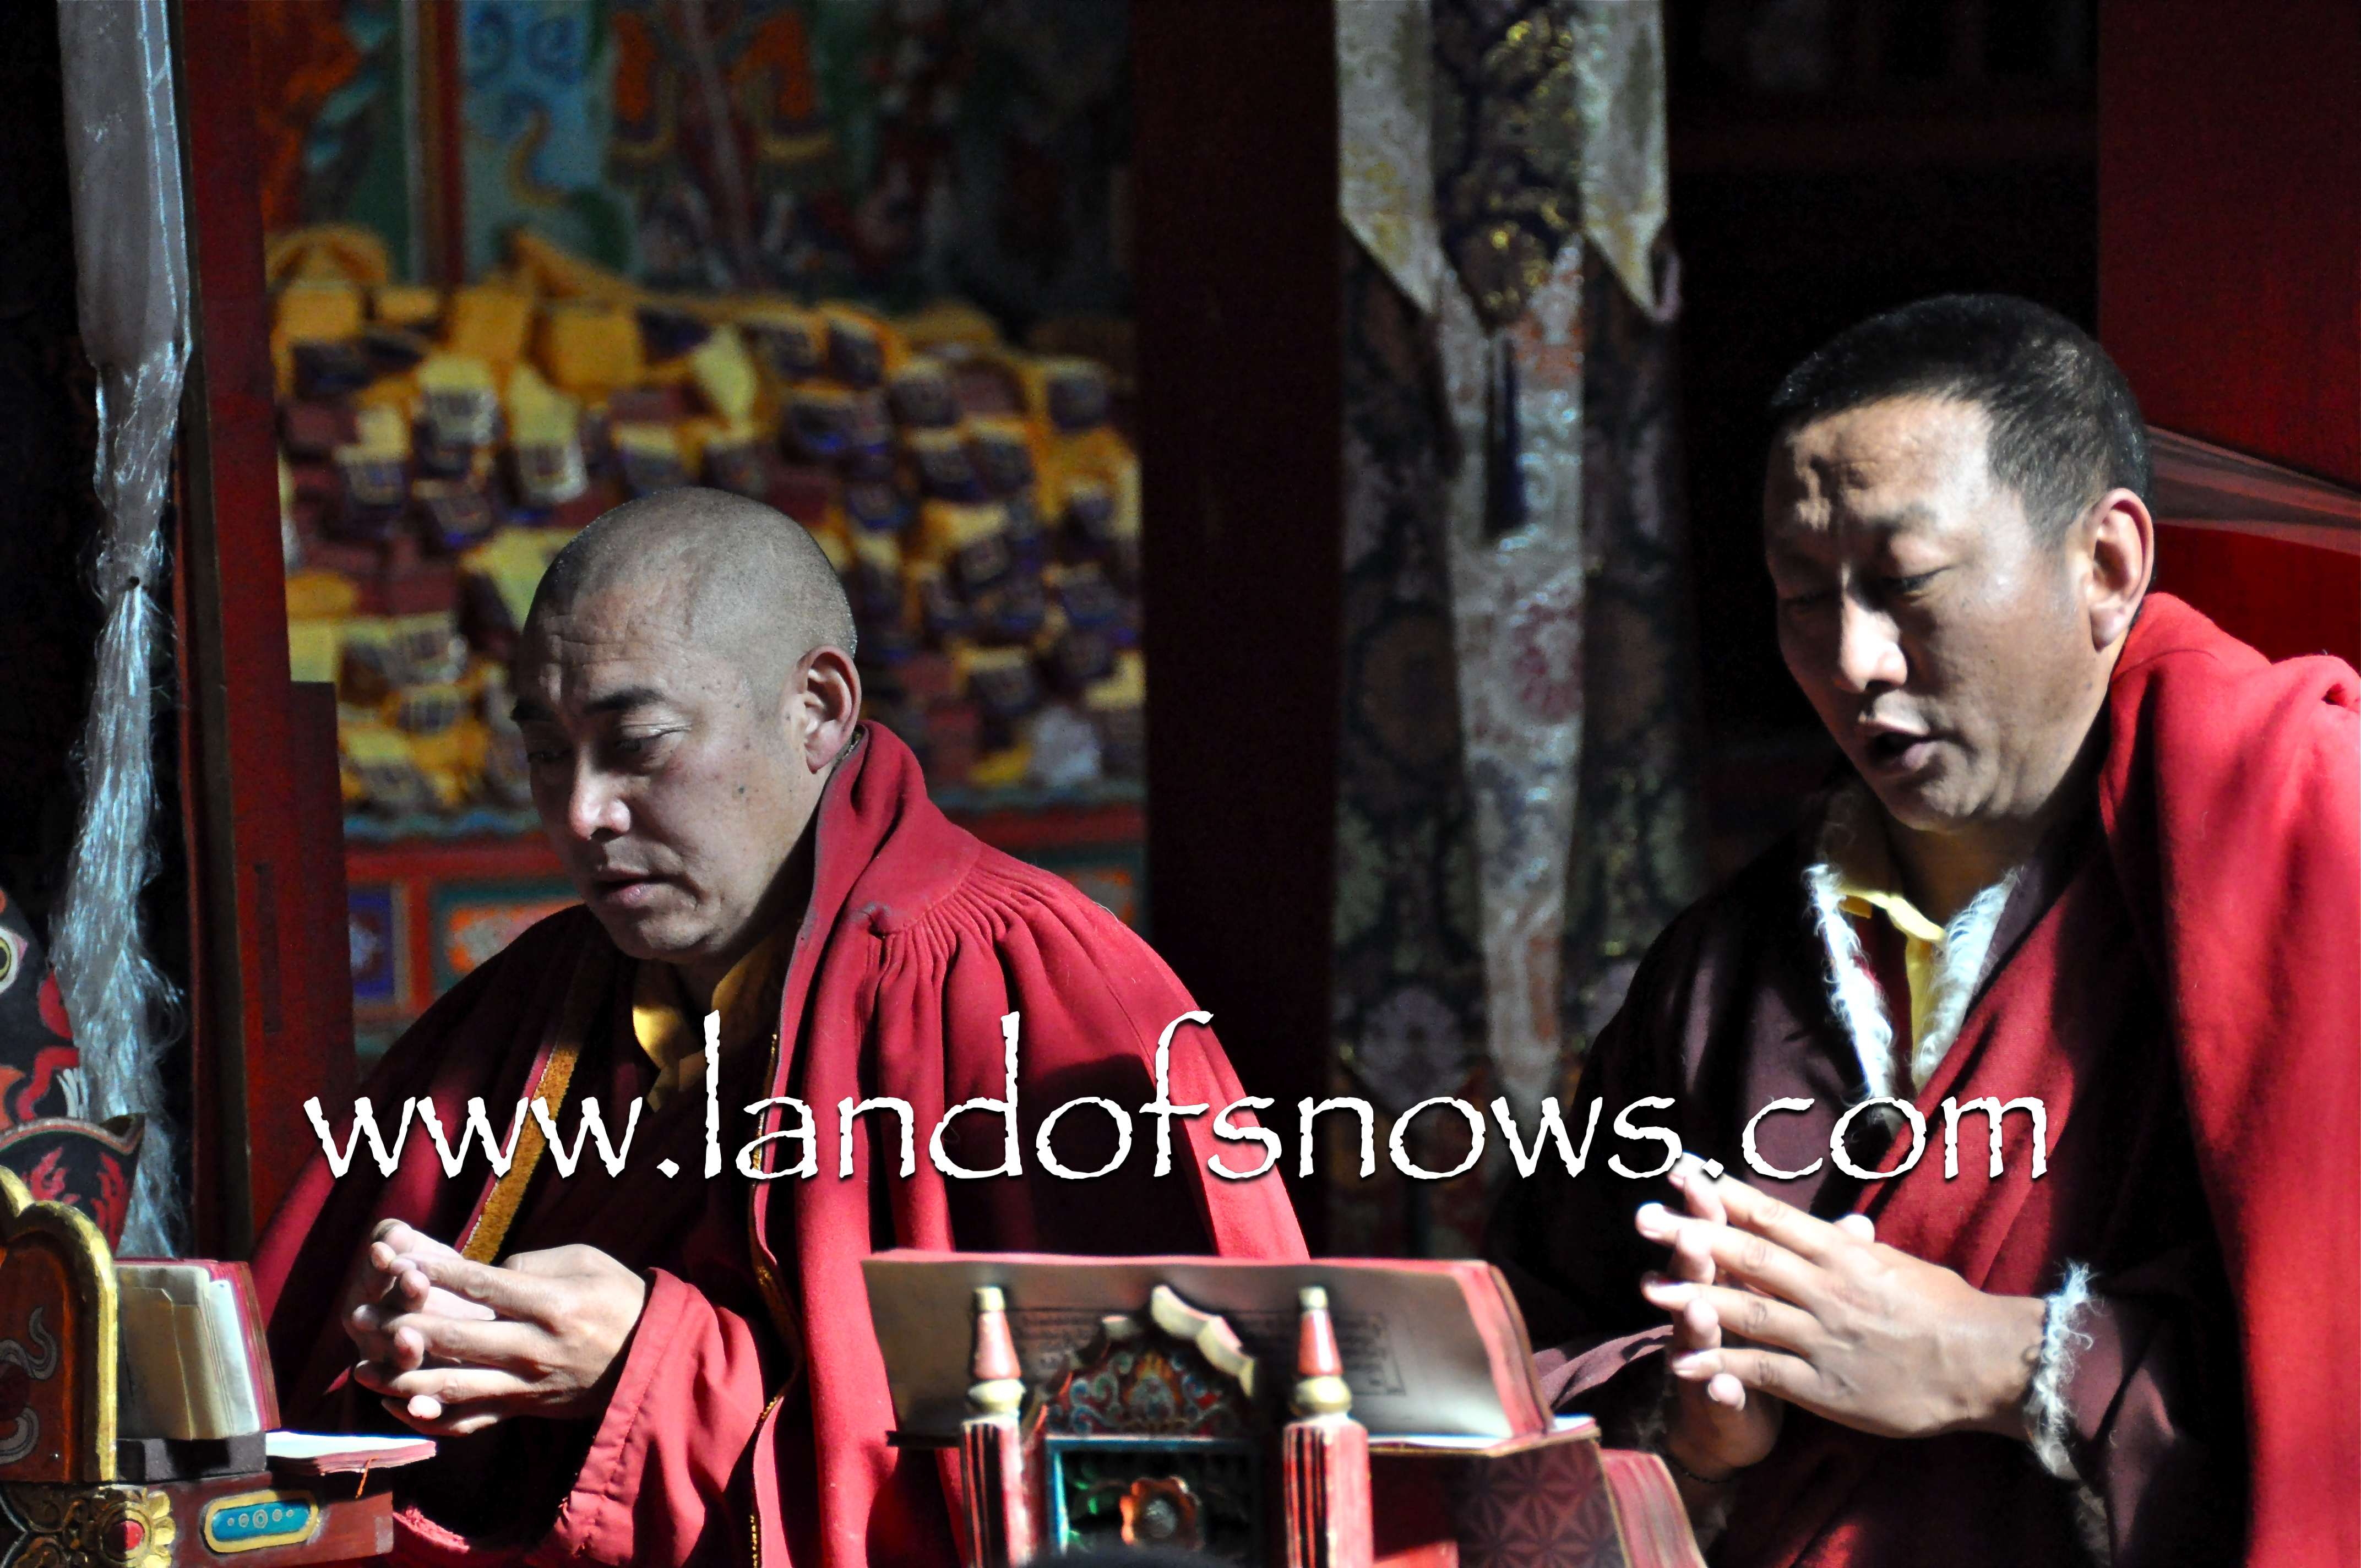 Inside a Tibetan Buddhist Monastery - The Land of Snows